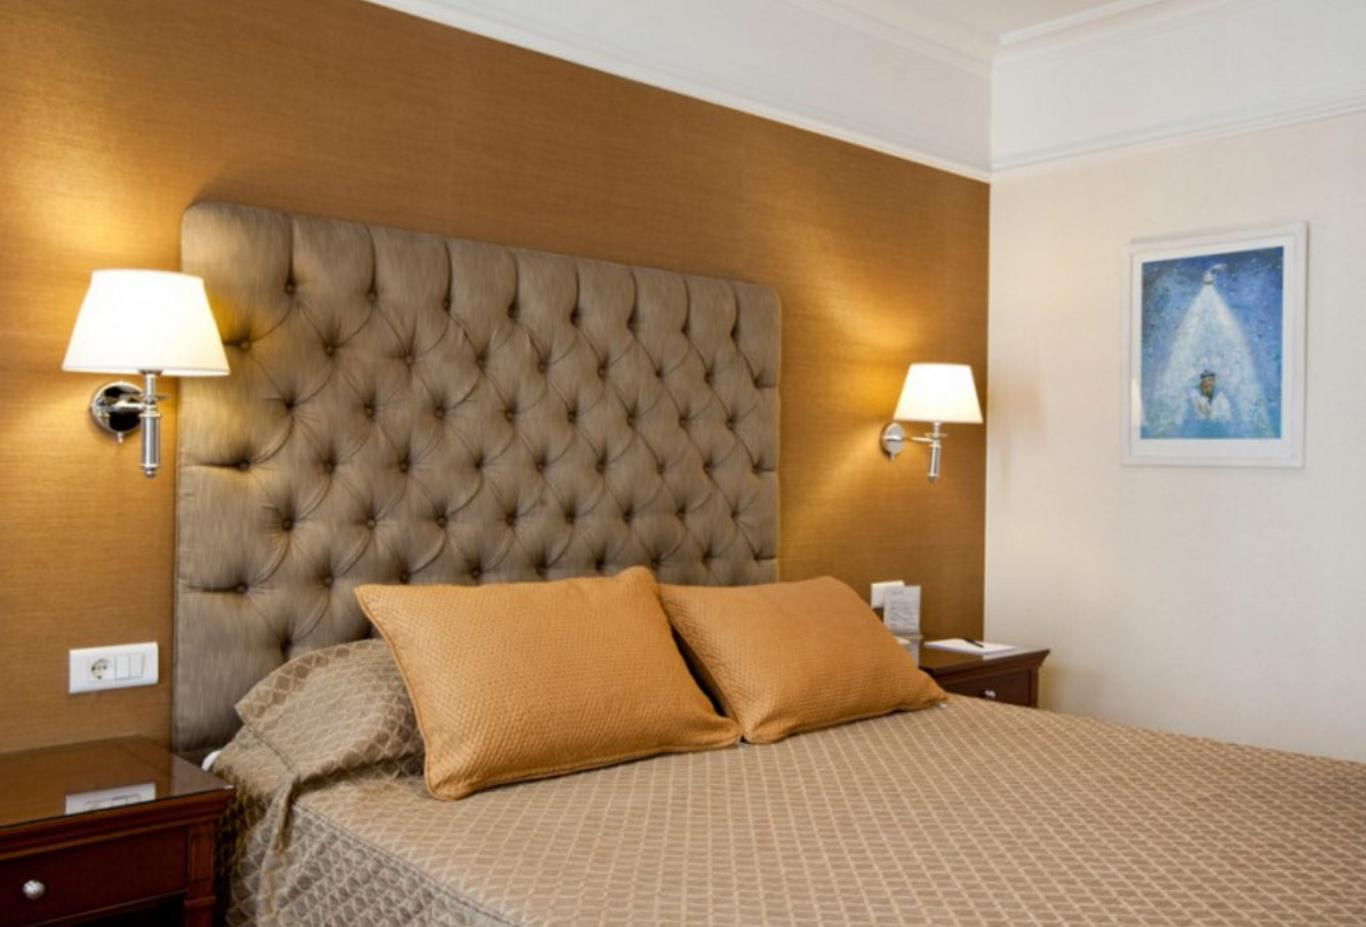 Standard-Room double bed